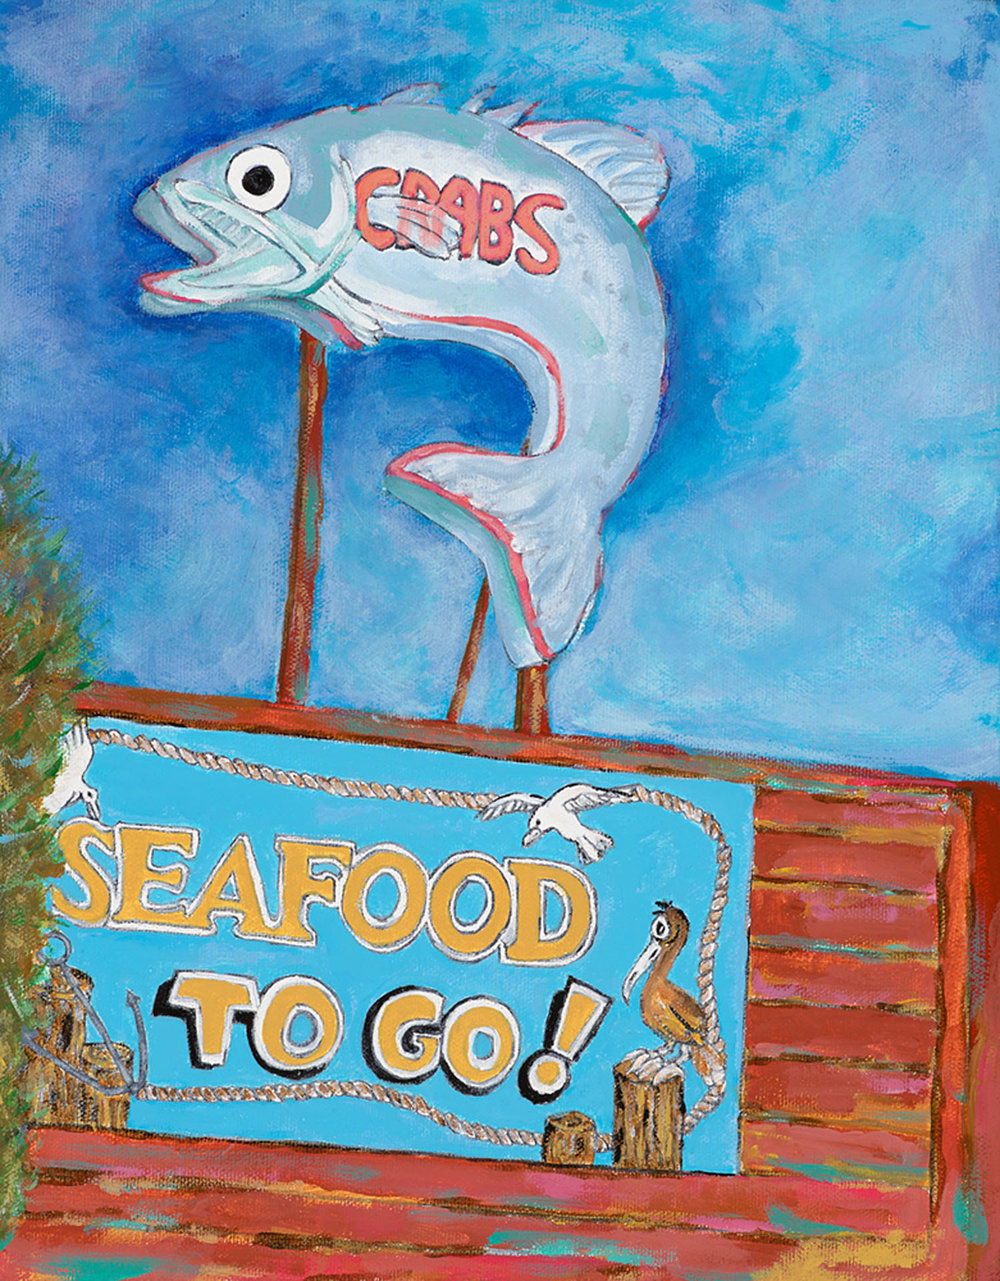 Barbara's Fish Trap: Half Moon Bay